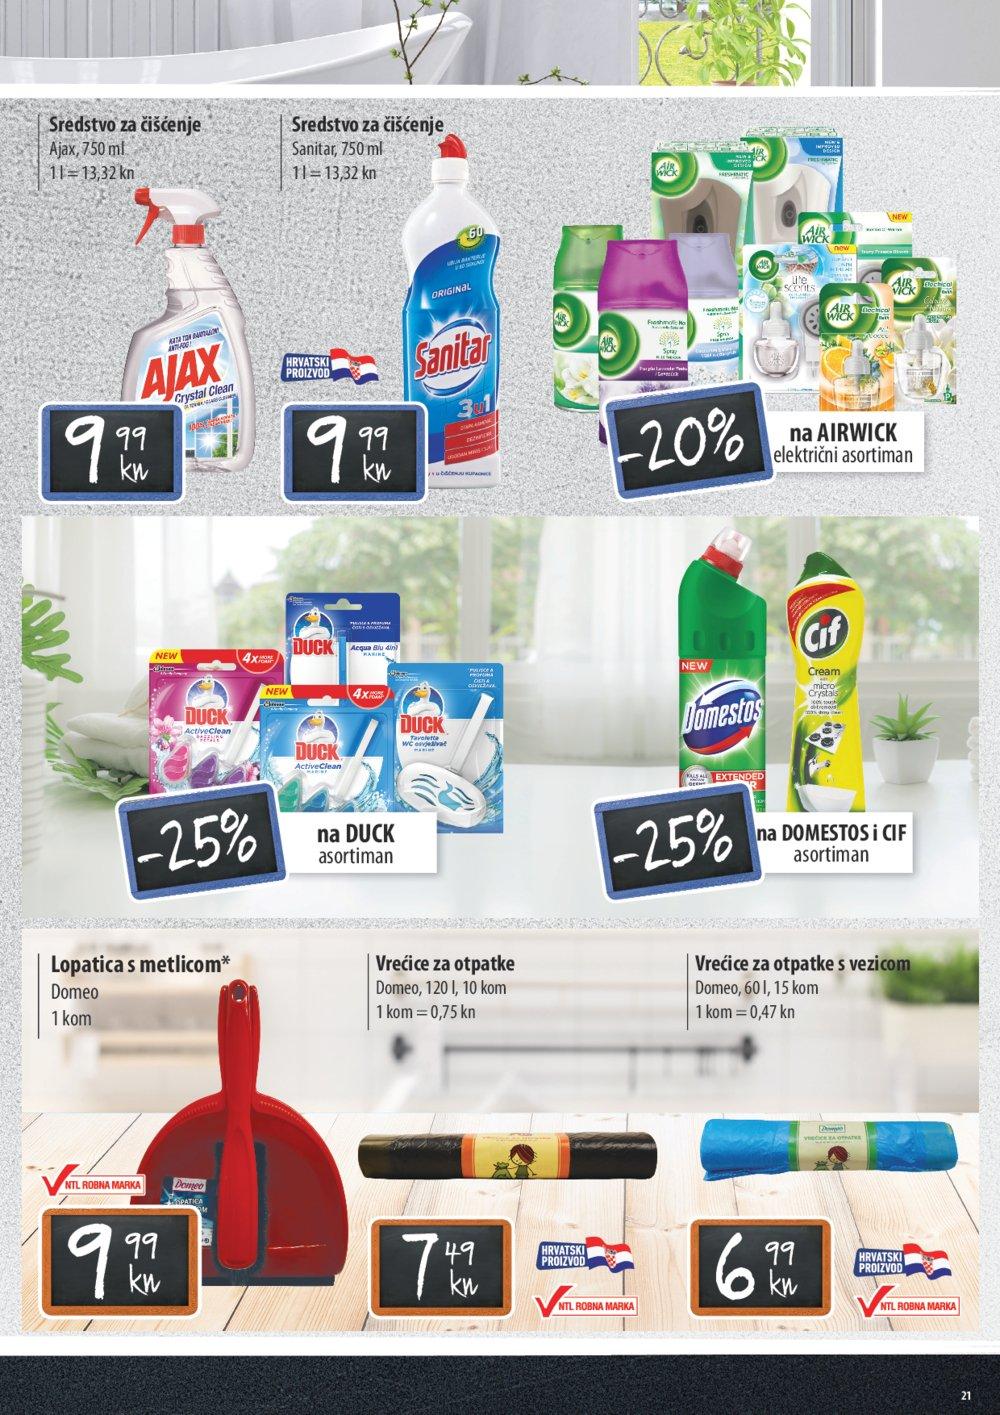 NTL Maxi katalog Akcija 07.11.-13.11.2019.